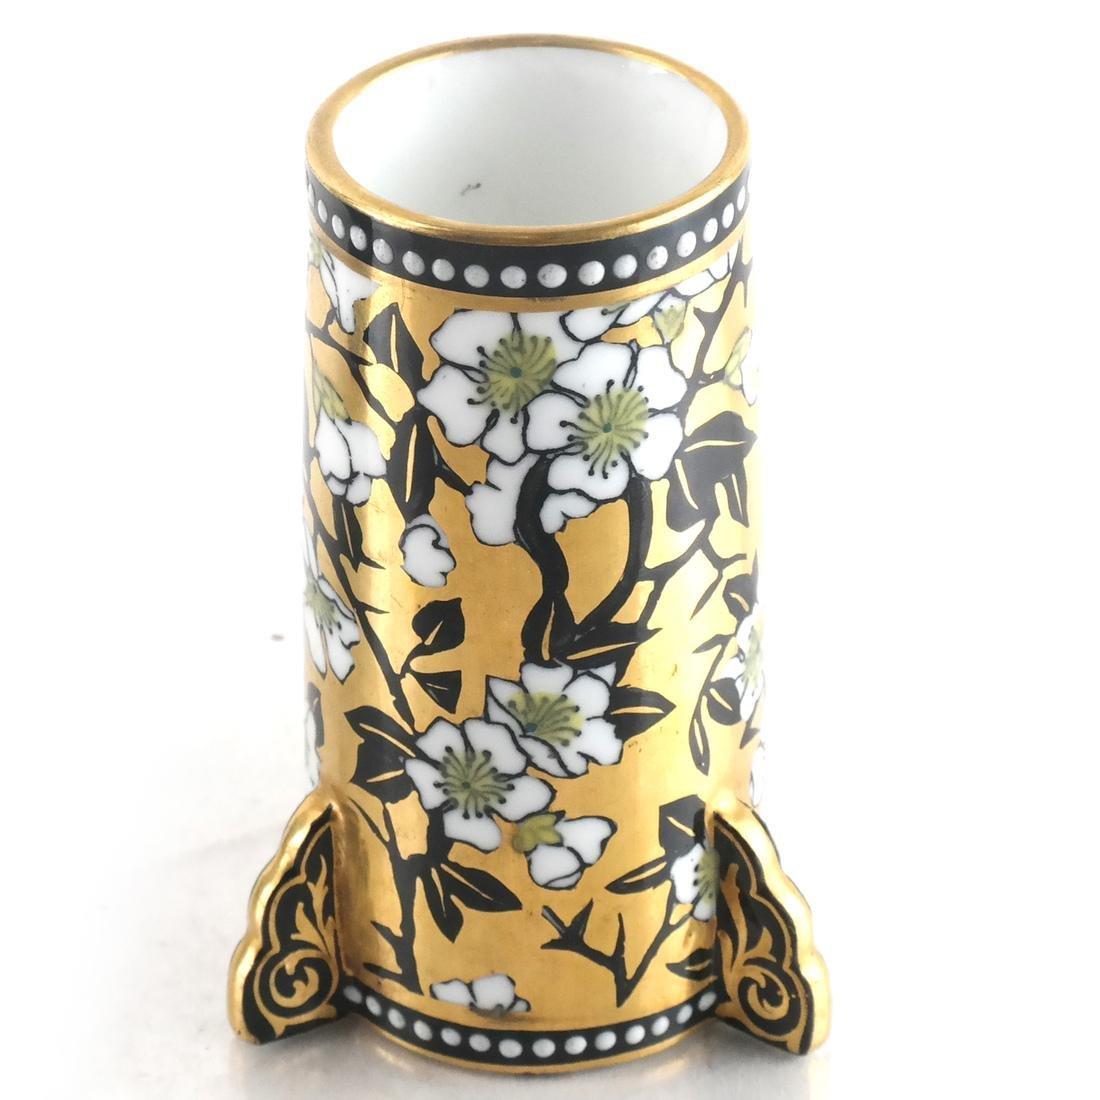 Three Decorated Porcelain Bud Vases - 4